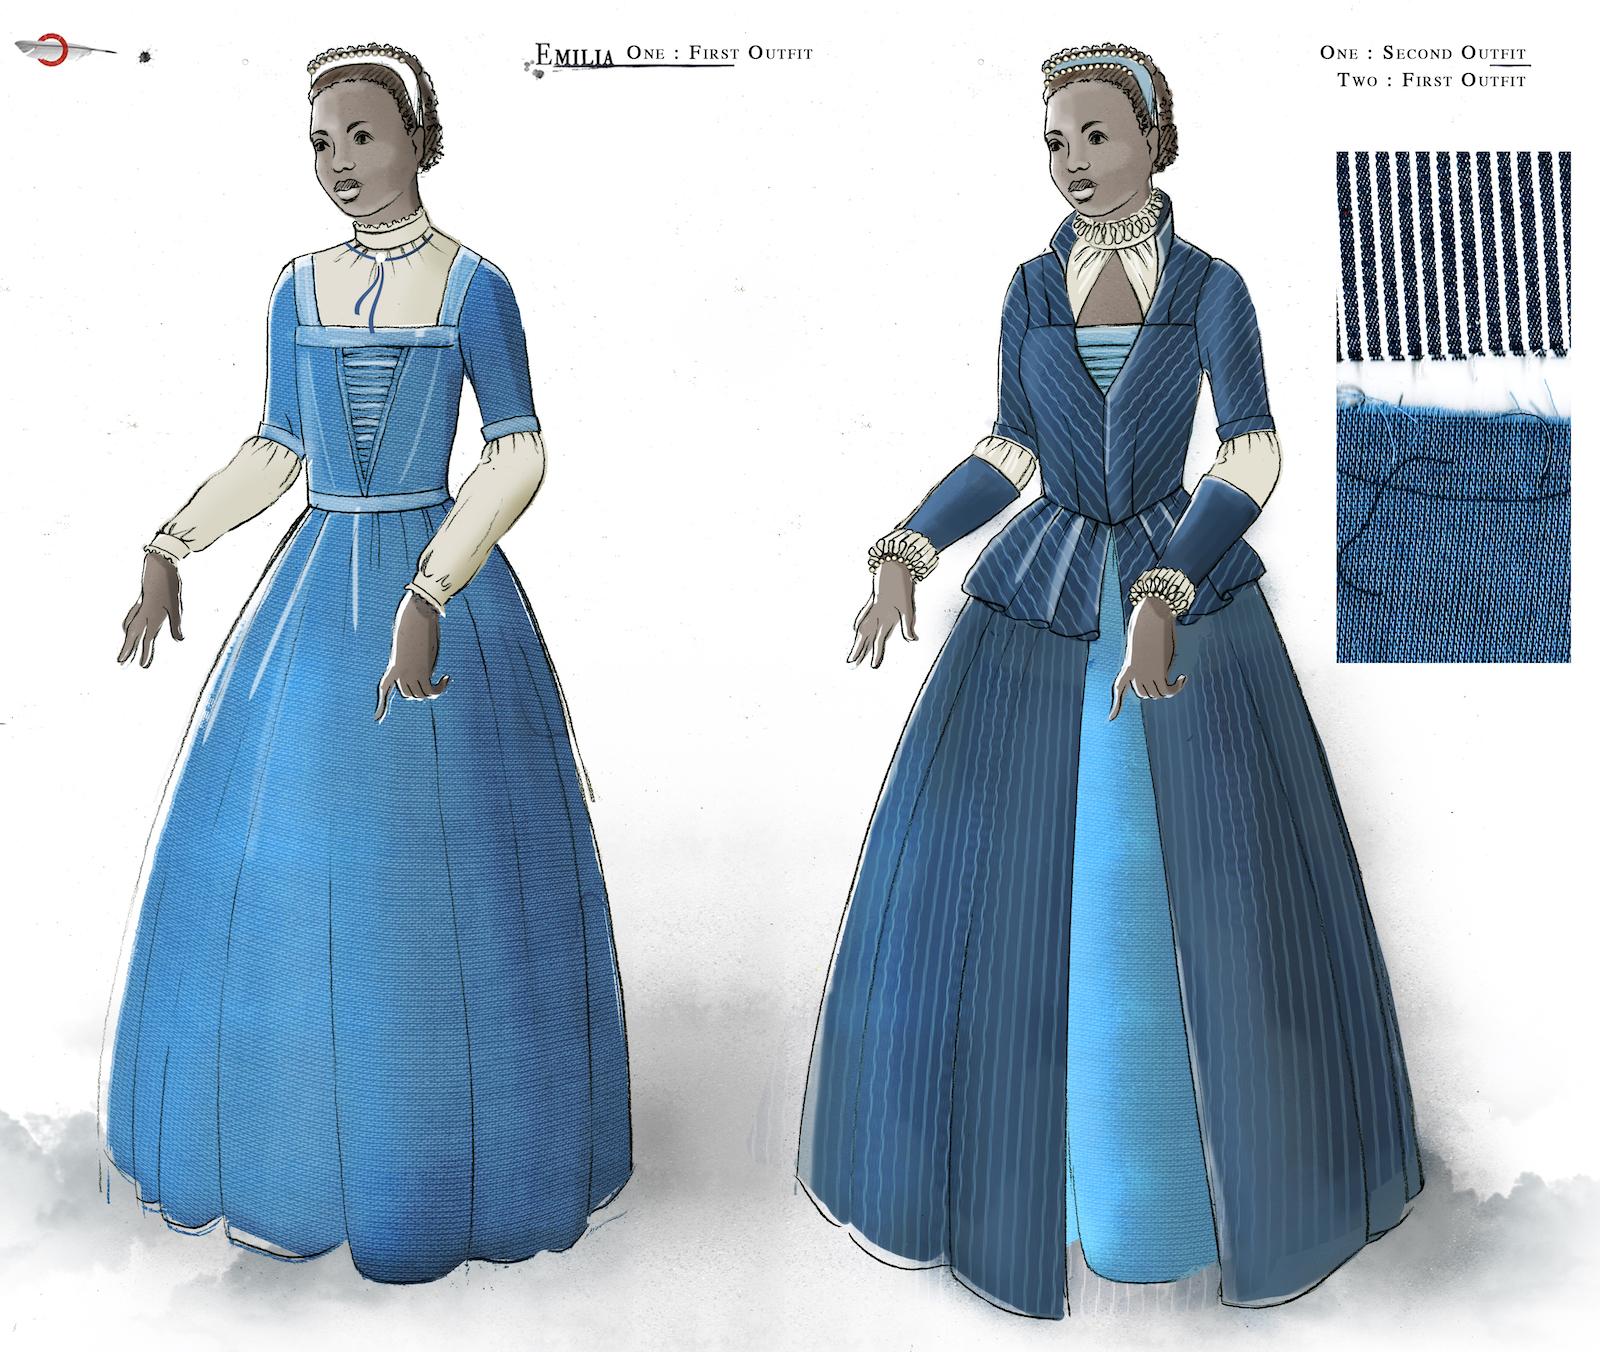 A costume sketch of two blue Elizabethan dresses